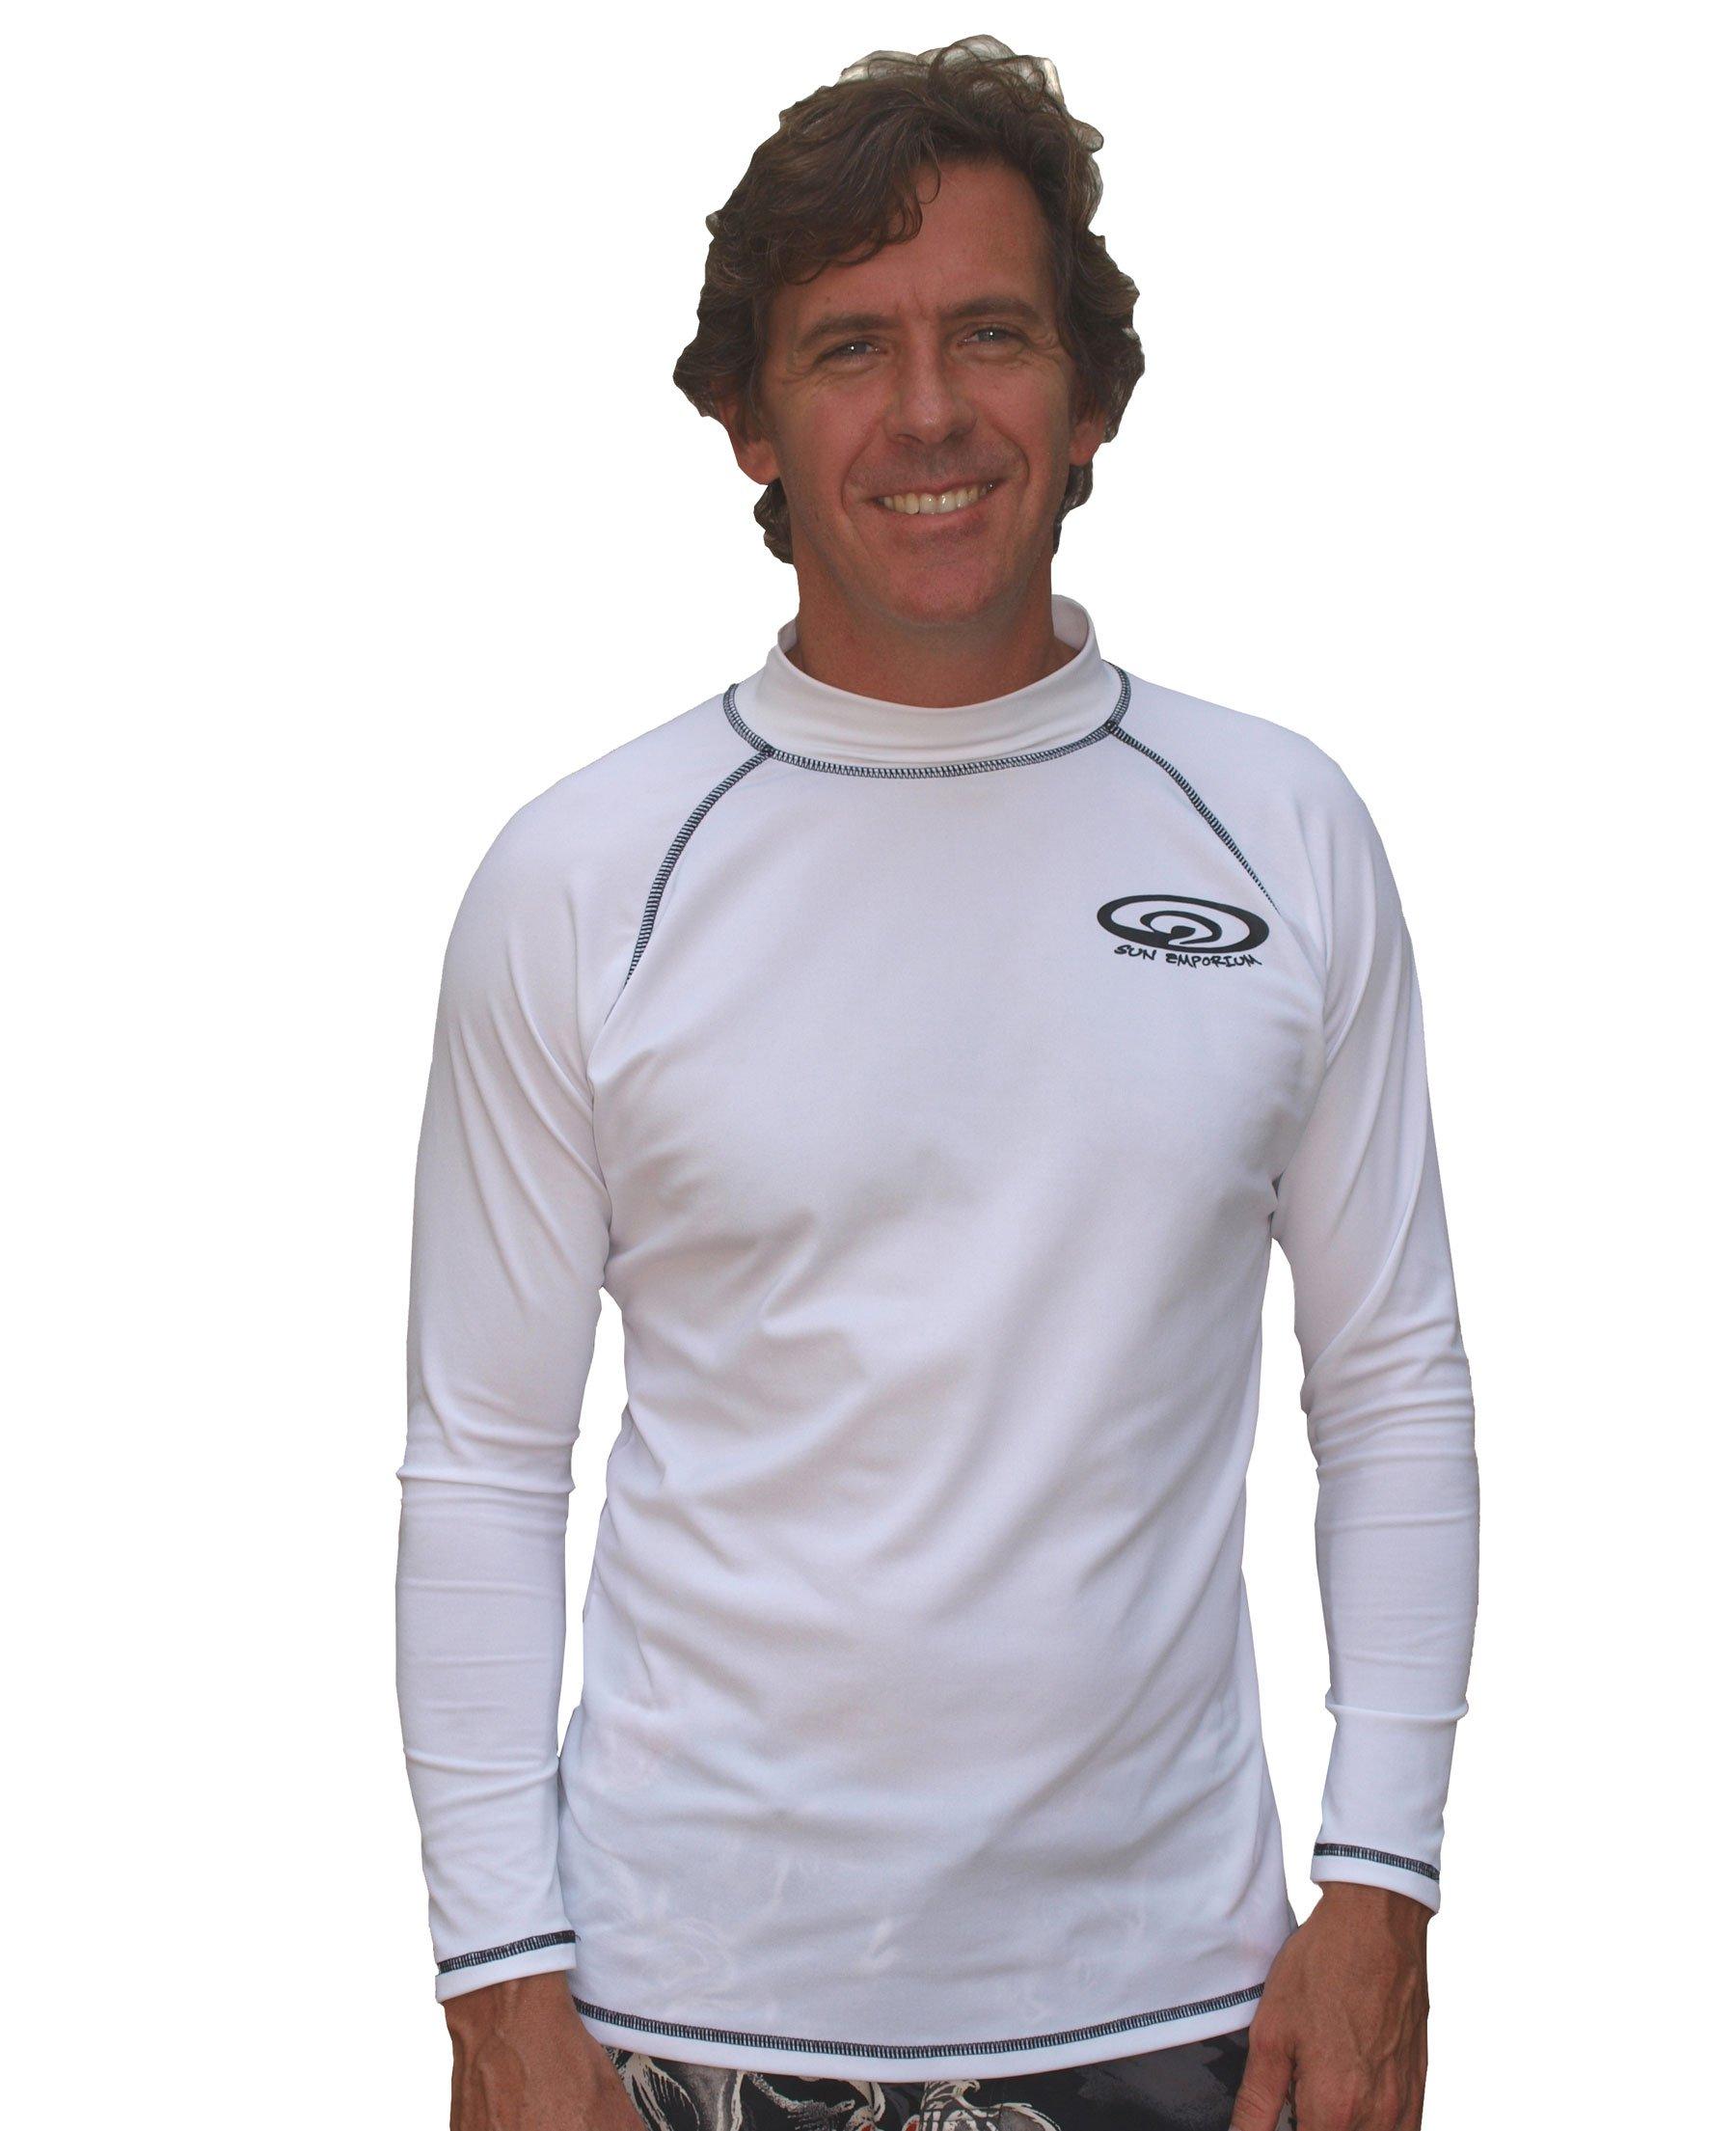 Sun Emporium White Long Sleeve Men's & Women's Rash Guard Swim Shirt (5XL)